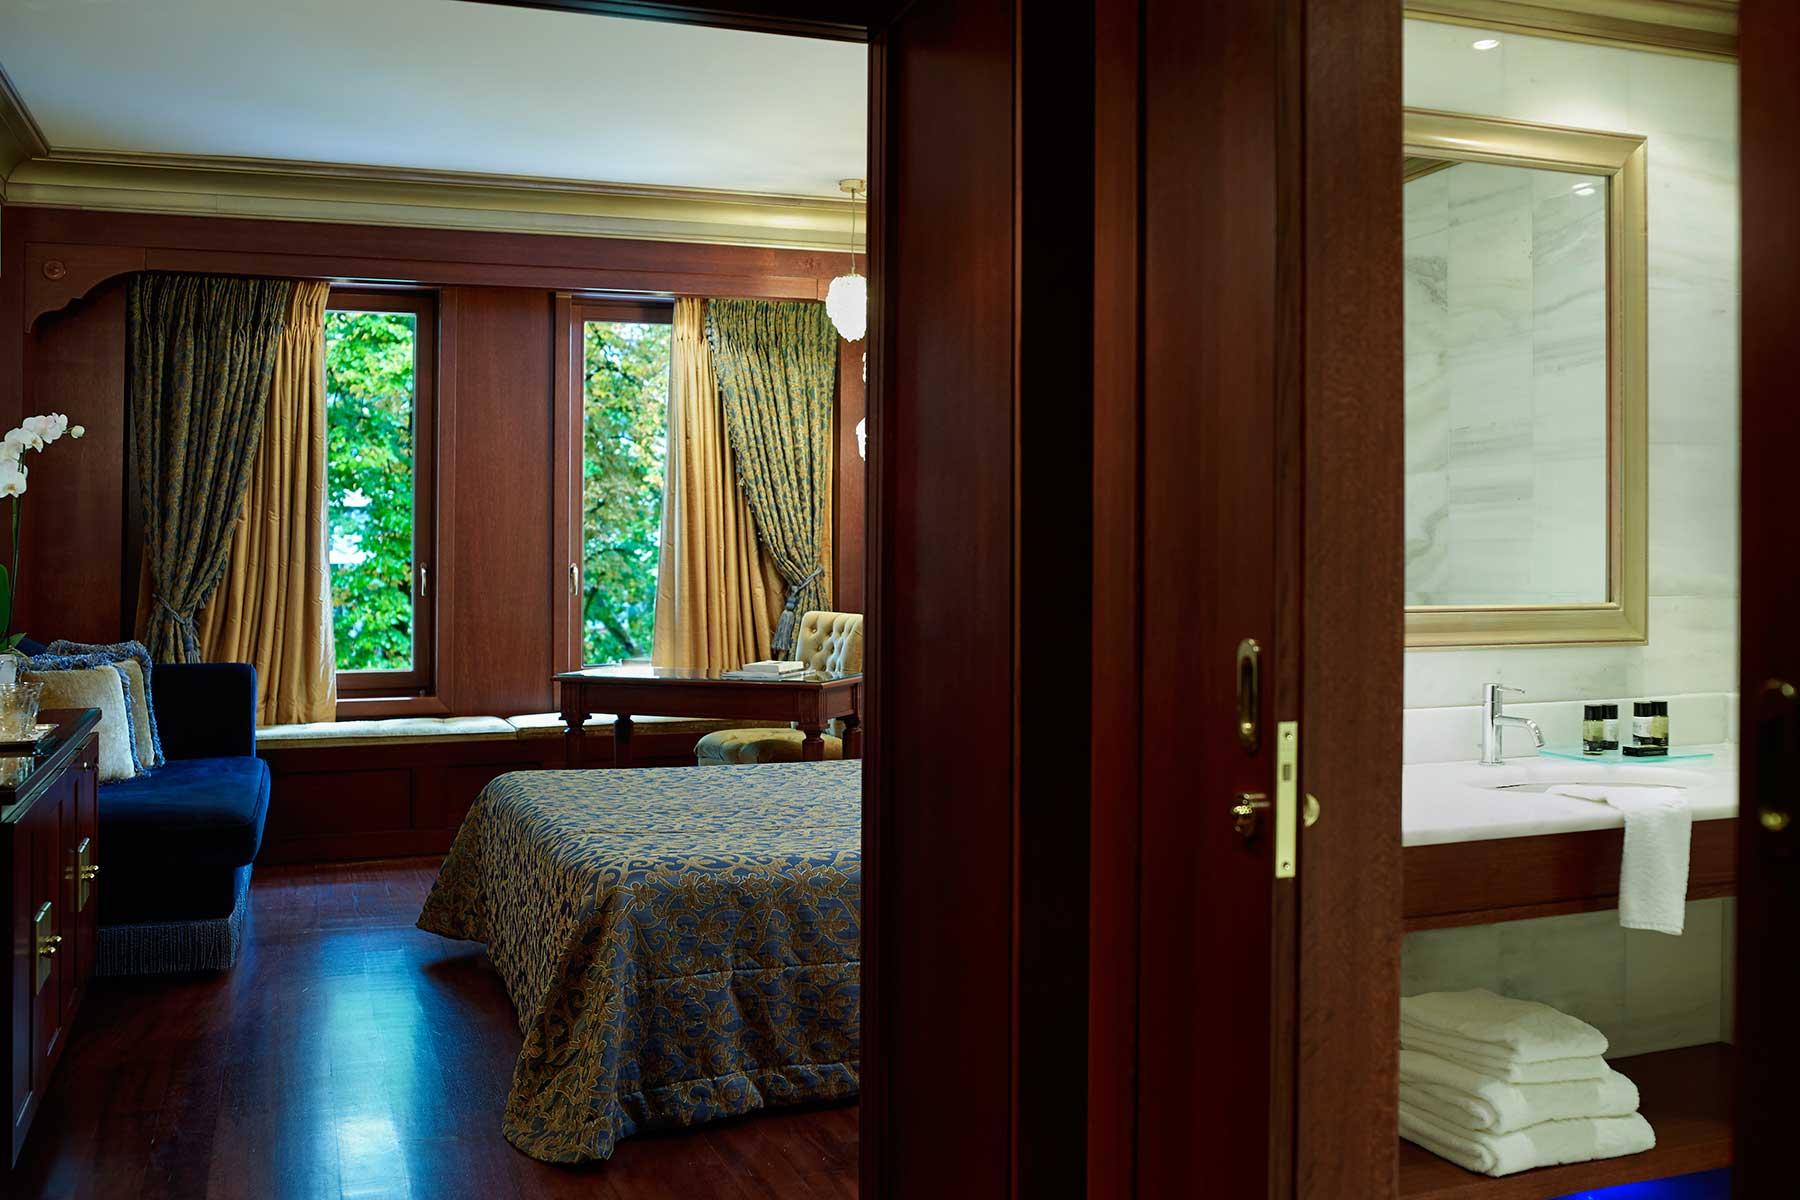 grand-serai-standart-double-room-ioannina-greece-3.jpg